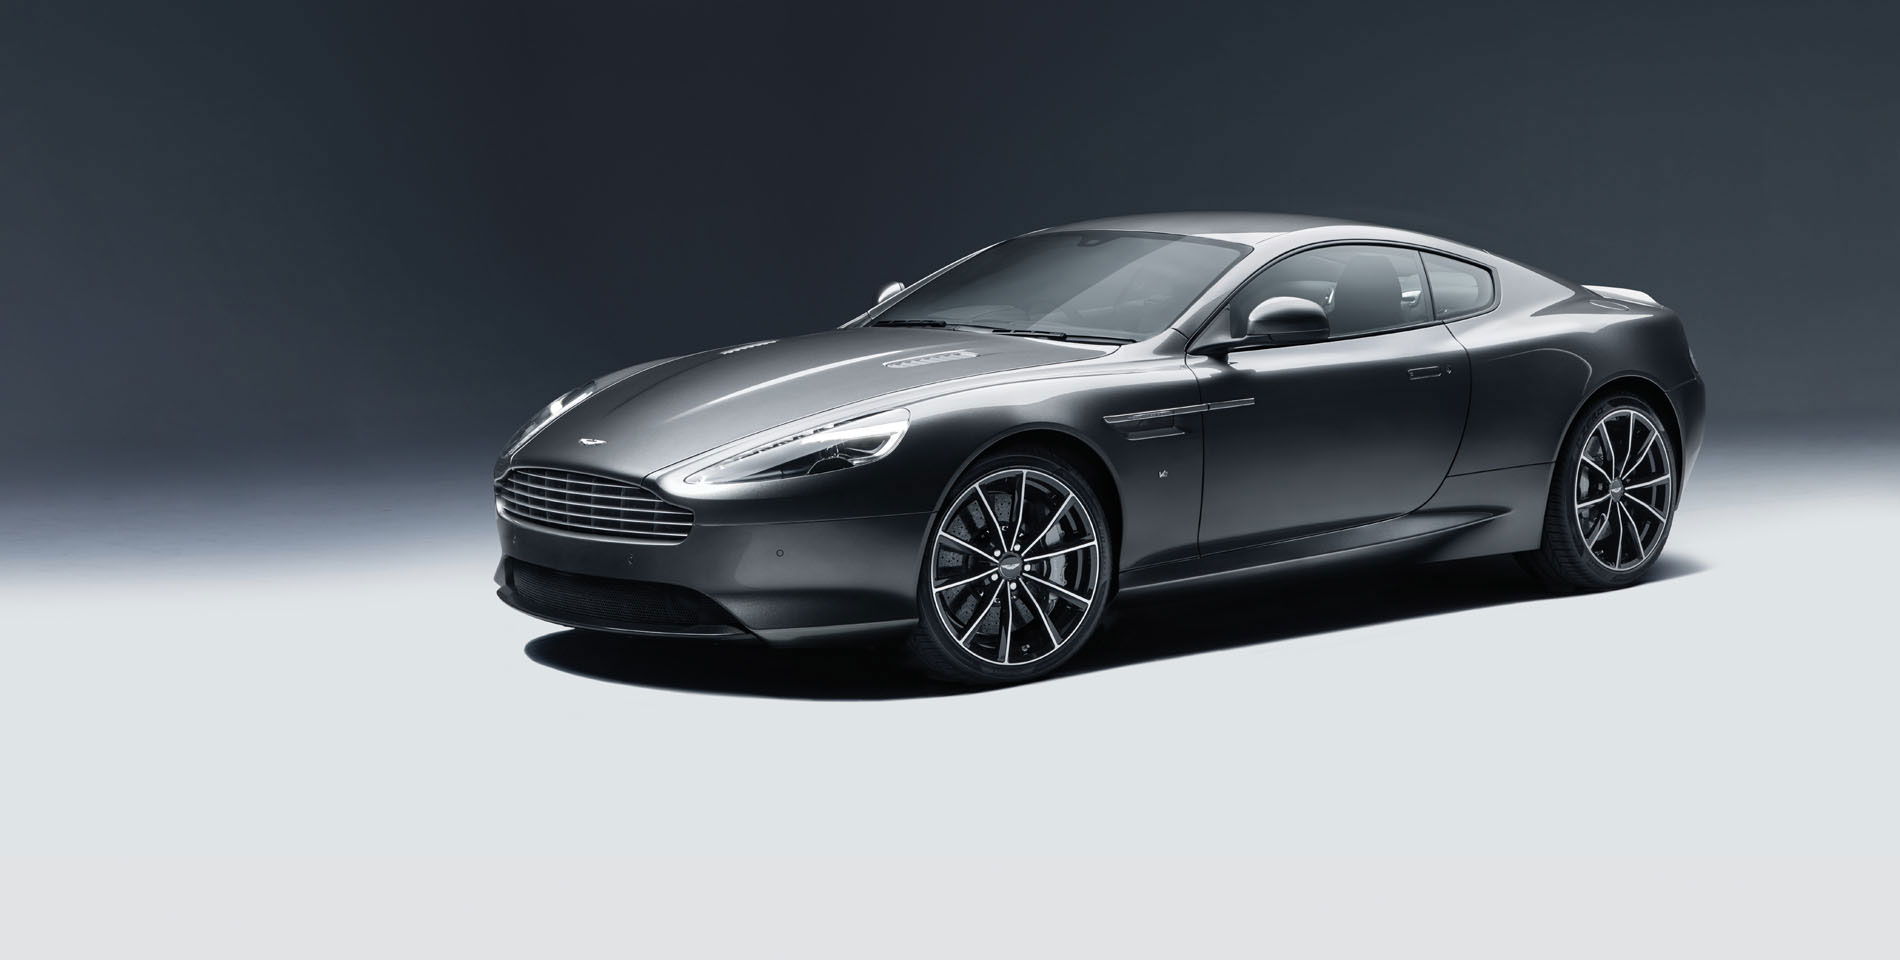 Aston Martin Db9 Miller Motorcars New Aston Martin Dealership In Greenwich Ct